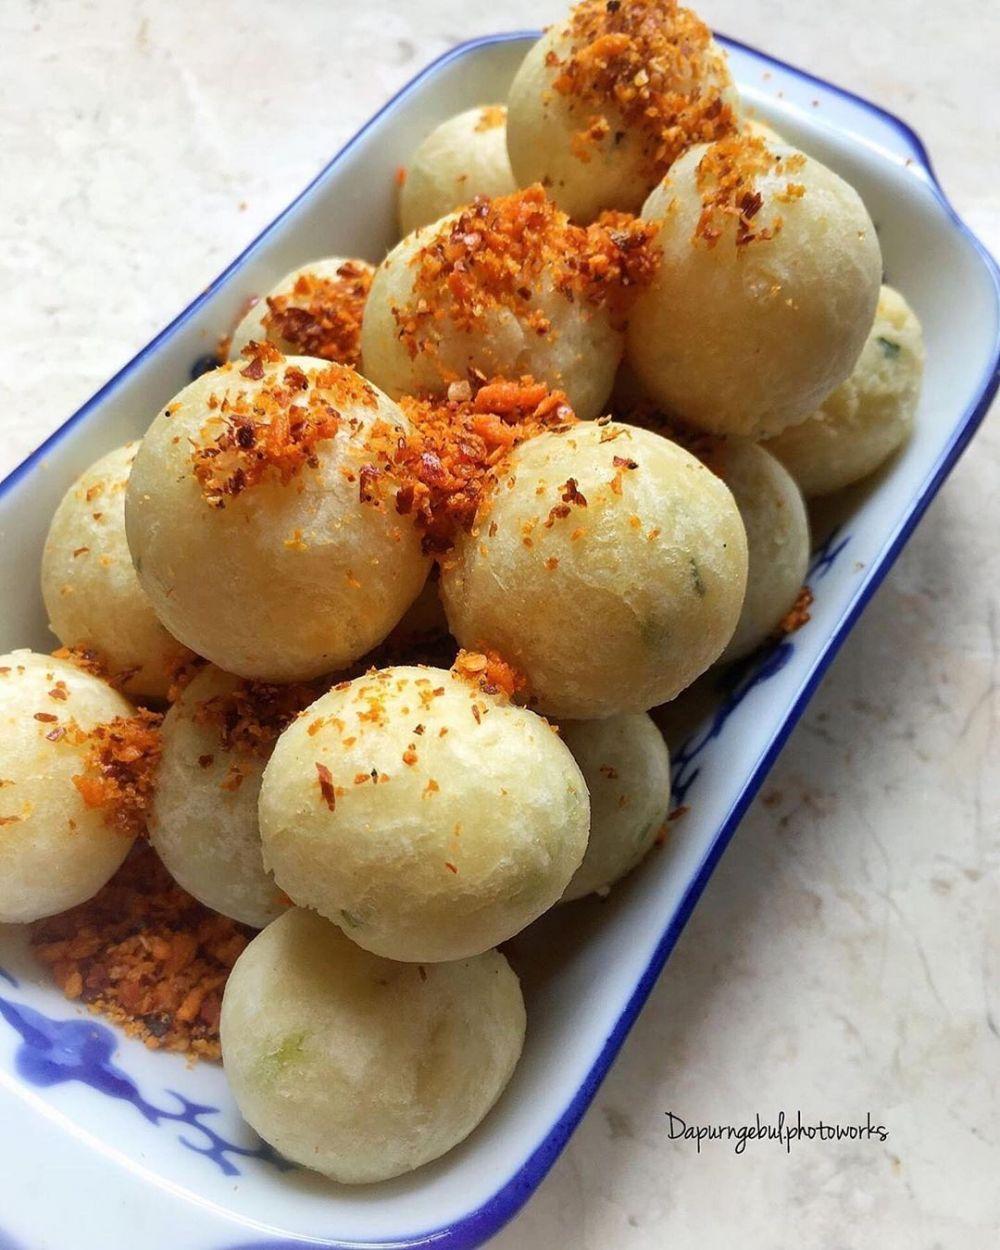 Resep cimol goreng ala rumahan Instagram ; cookpad © 2021 brilio.net